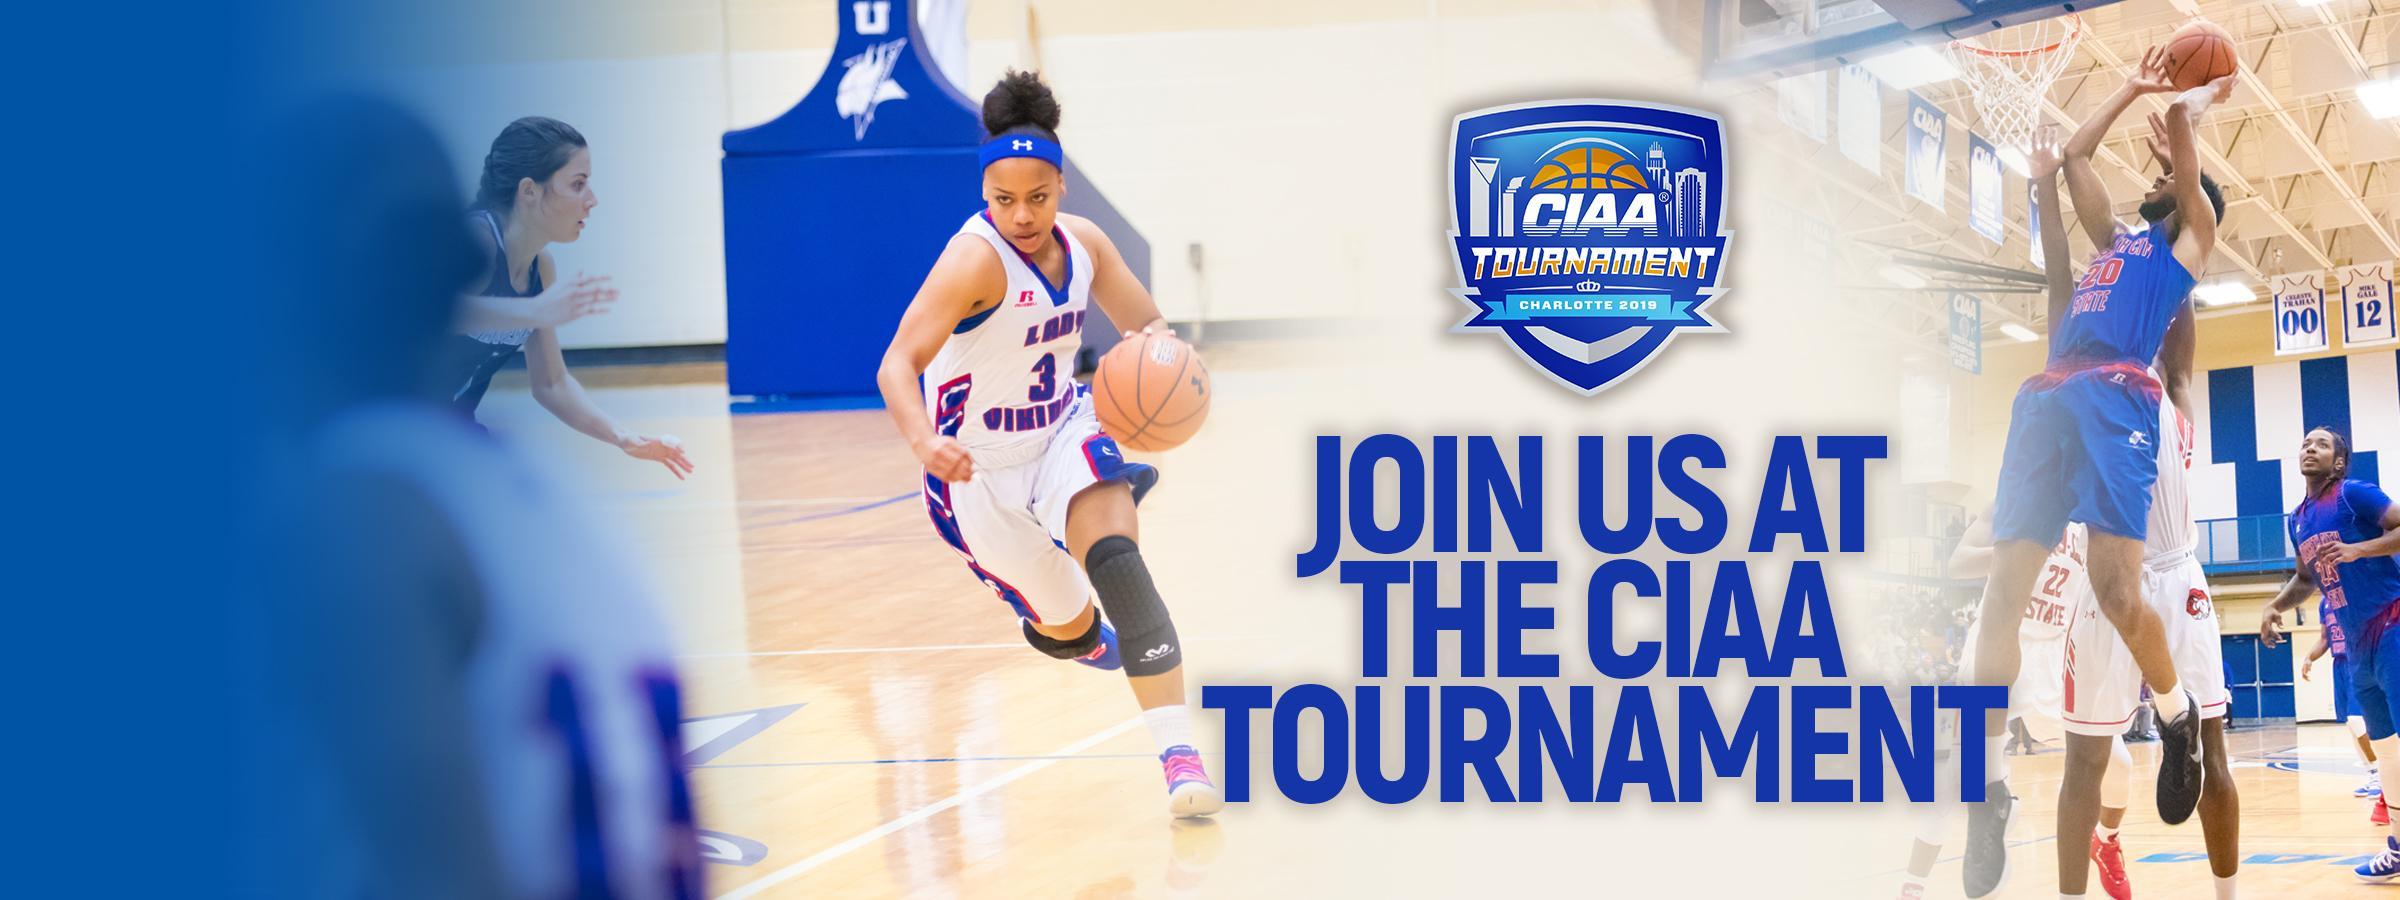 2019 CIAA Tournament